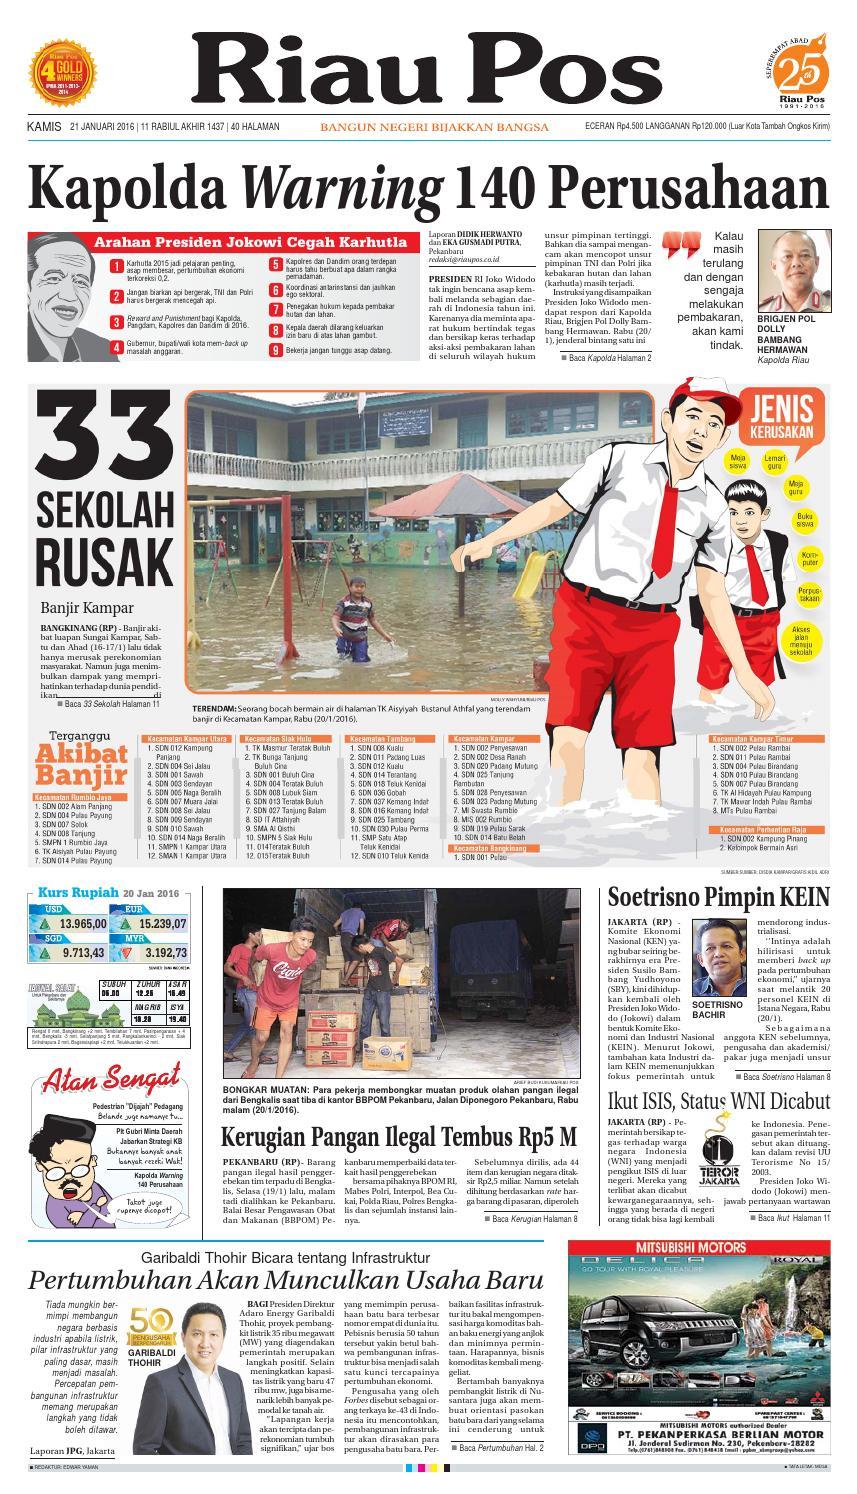 Riau Pos By Issuu Produk Ukm Bumn Barbekyu Kelitik Surabaya